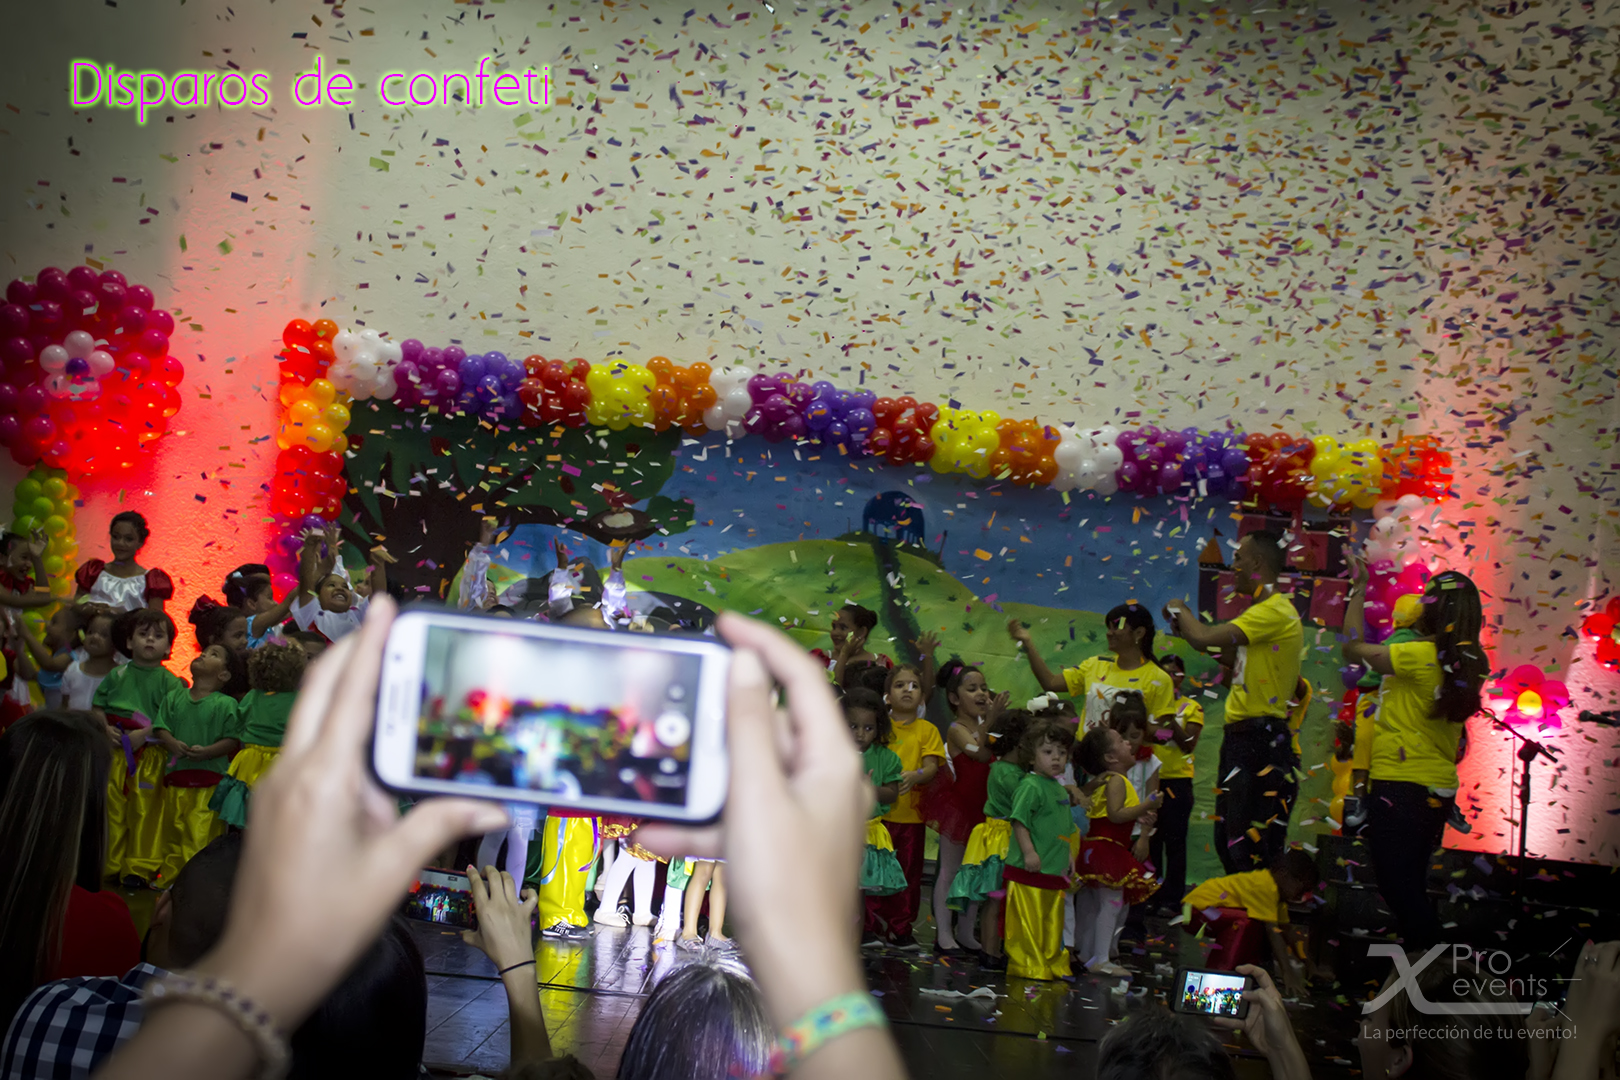 X Pro events - Casa del nino Montessori - Velada para las madres 2016 (110)